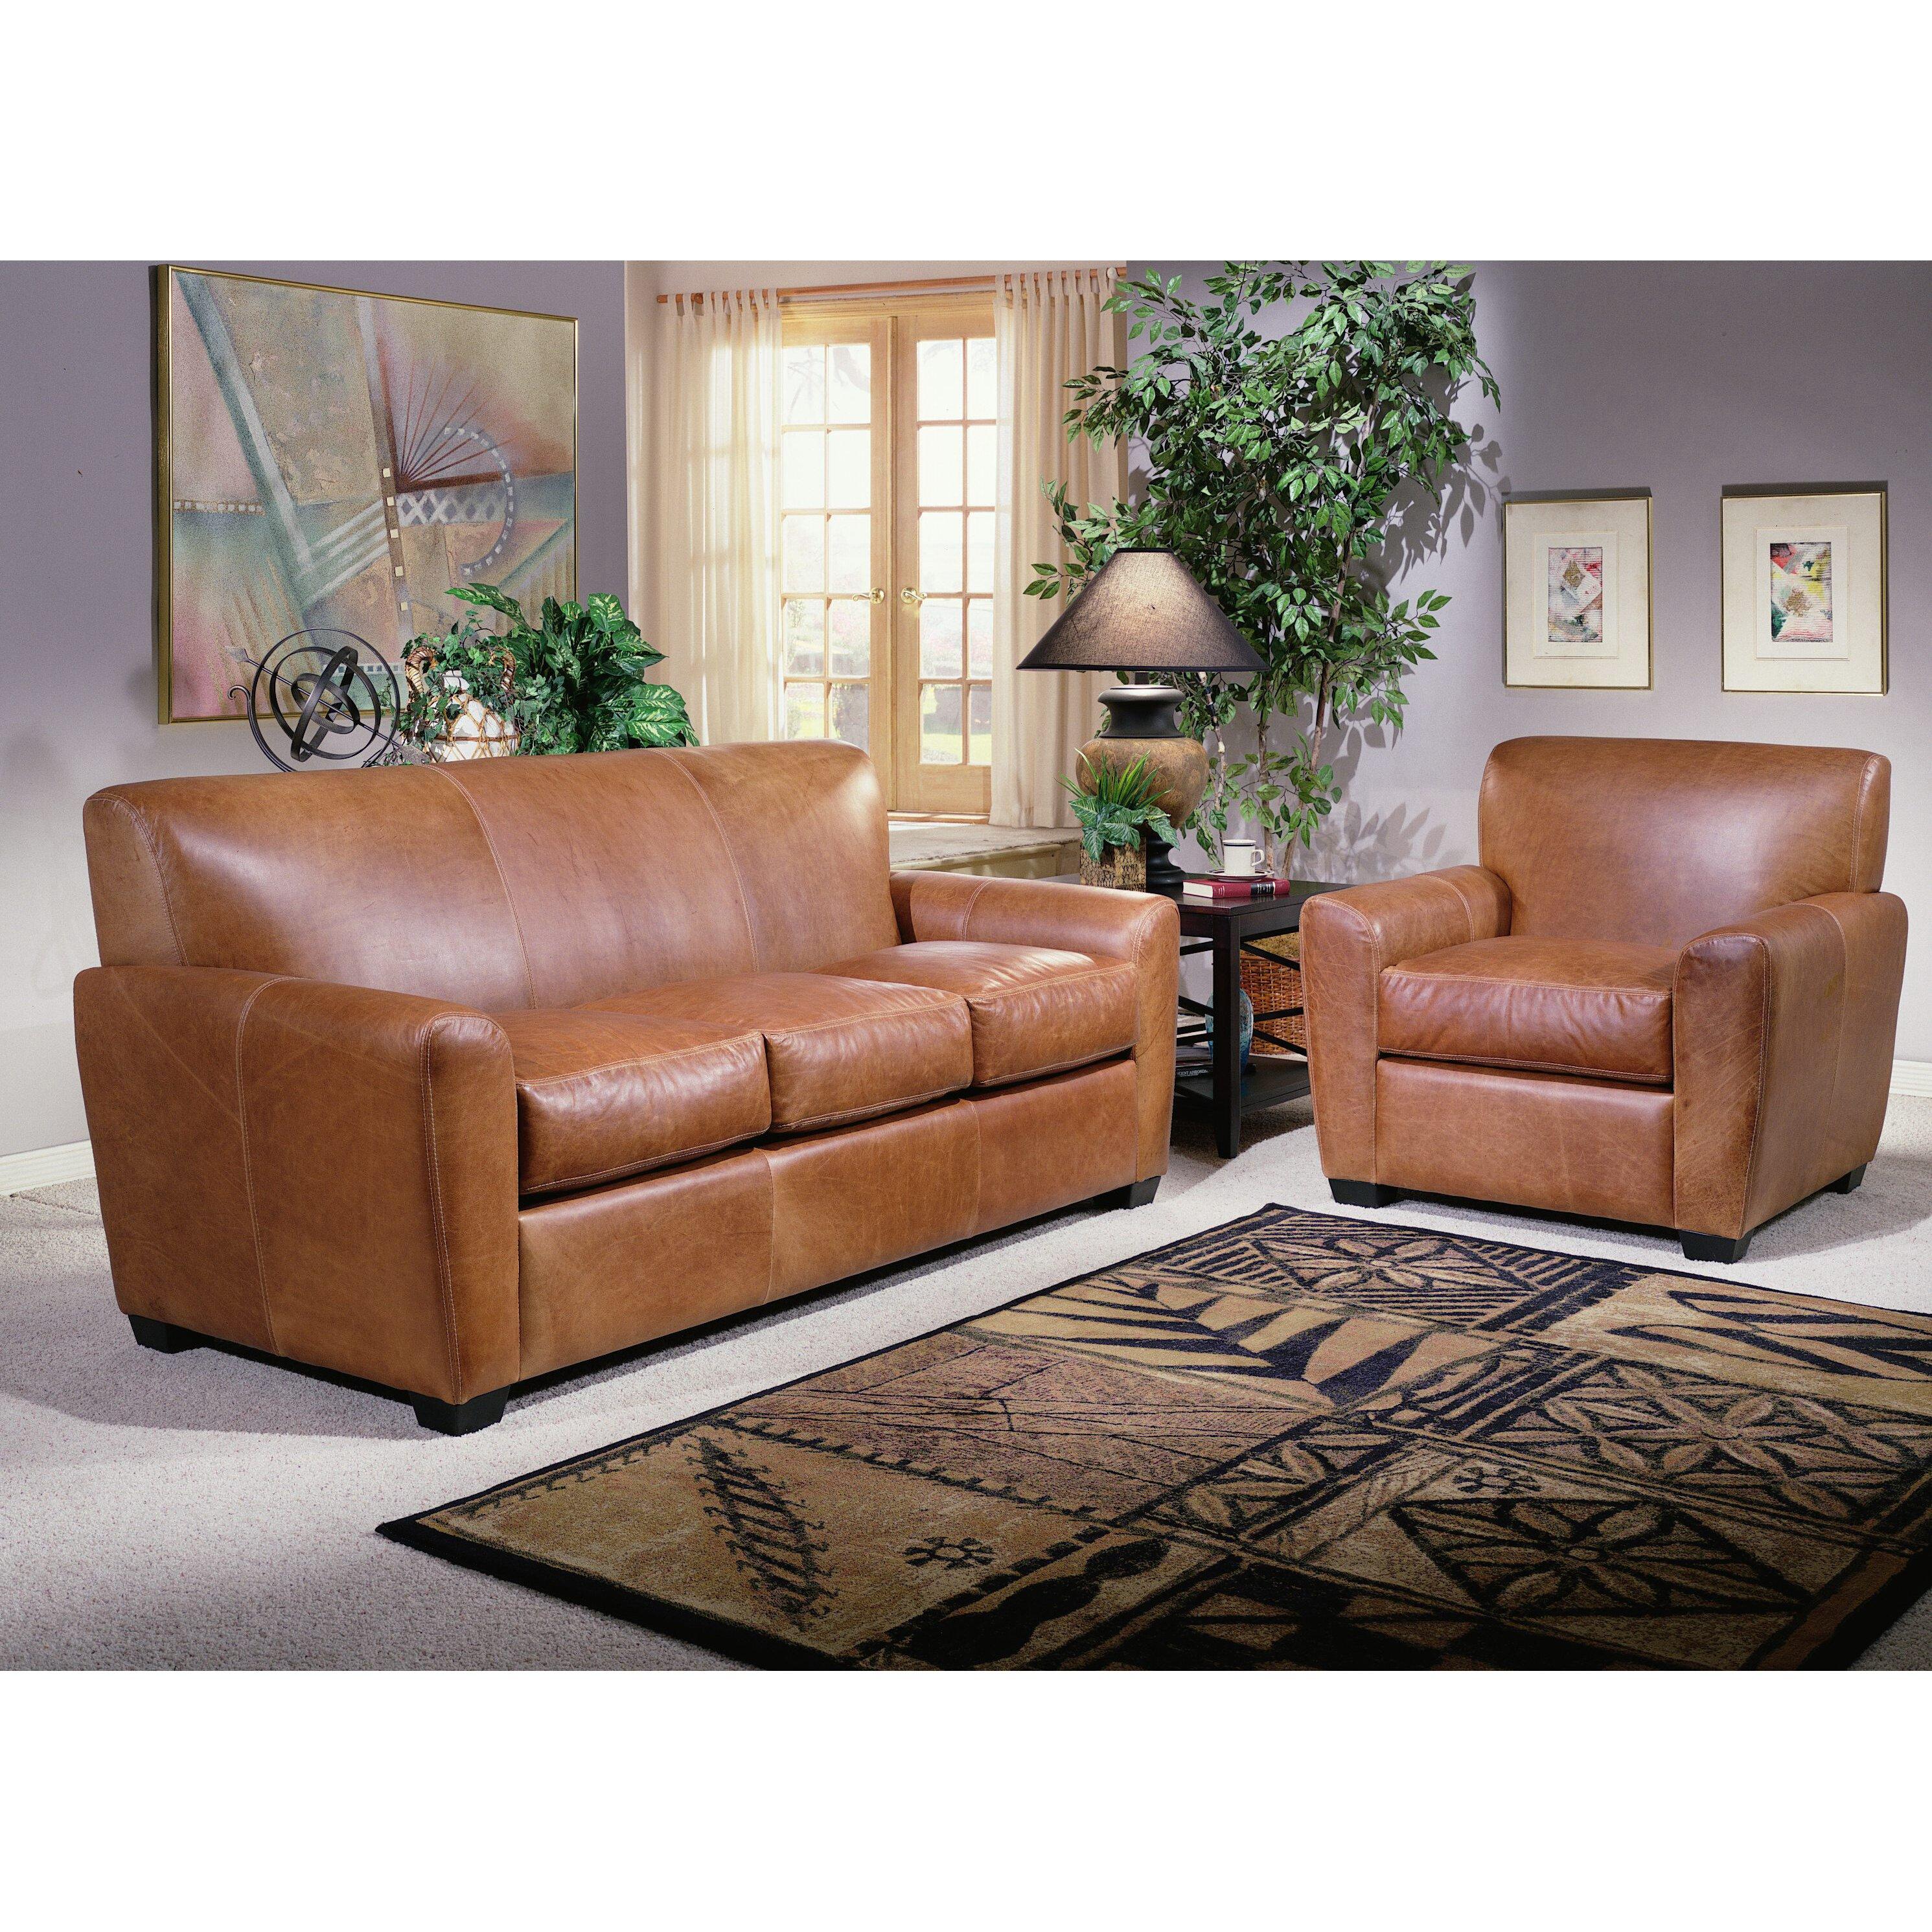 Armani Leather Sleeper Sofa